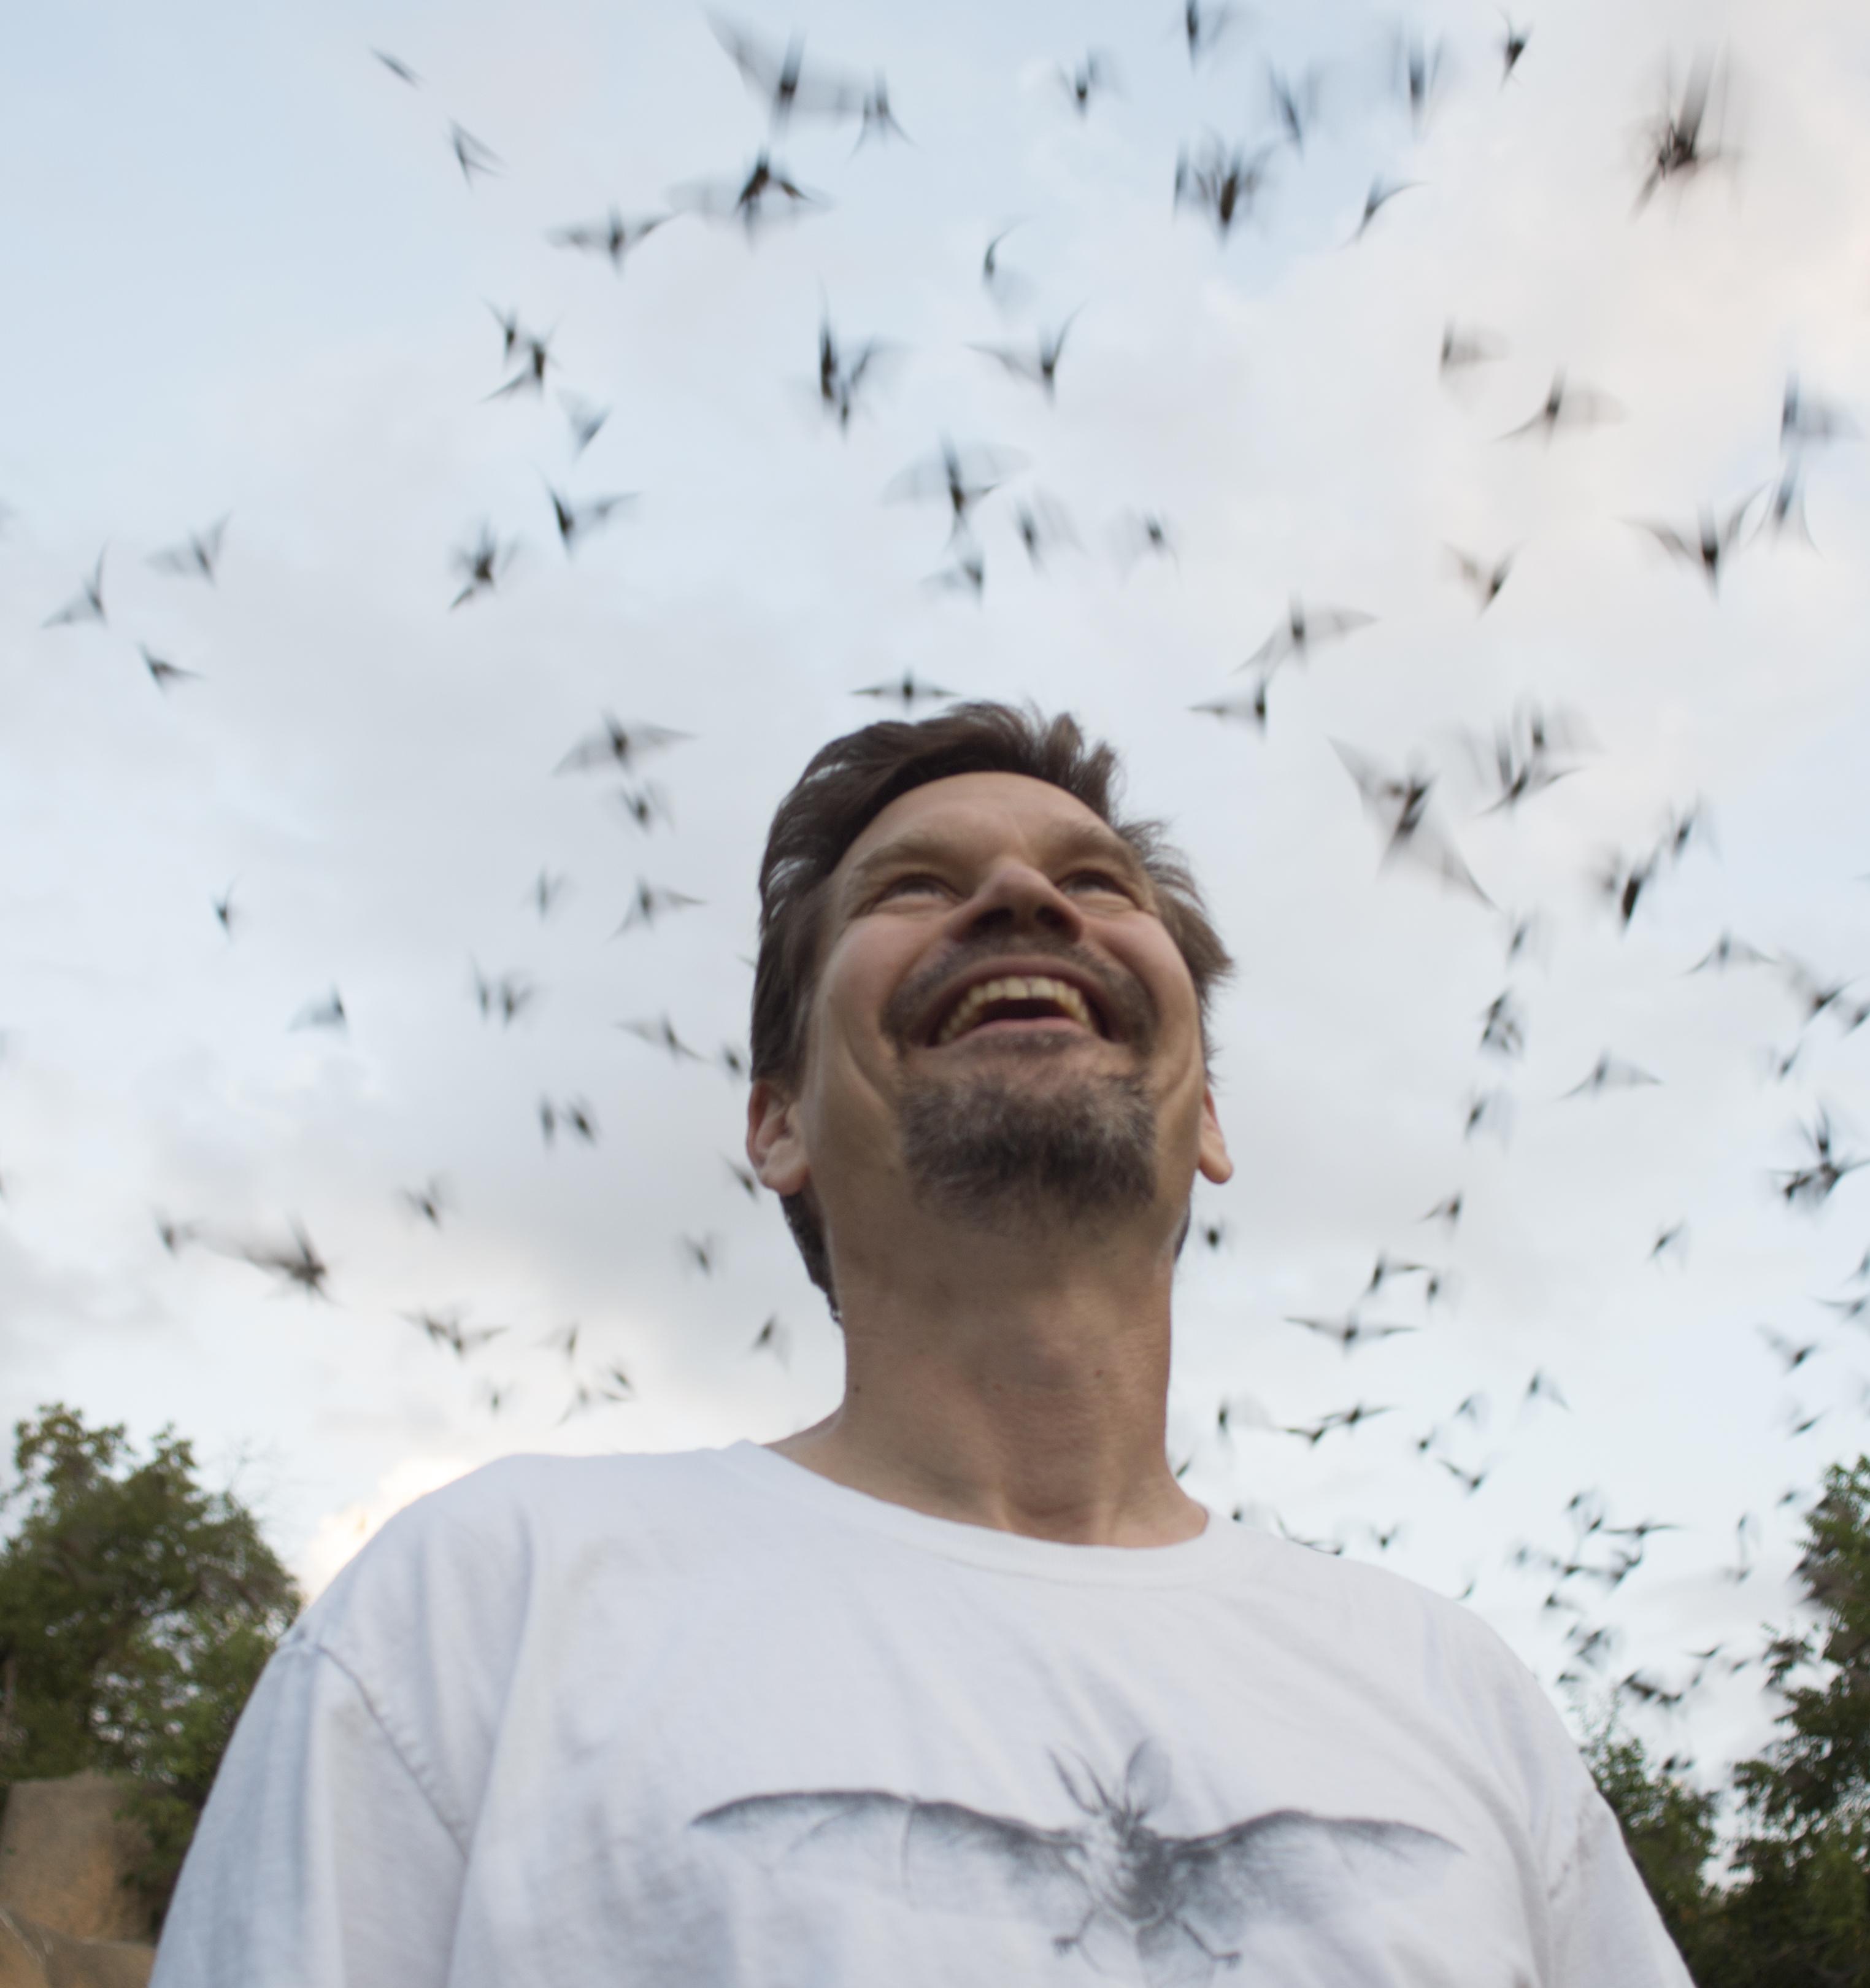 Lucas Miller at the Chiroptorium at Selah, Bamberger Ranch, Johnson City, TX in 2014